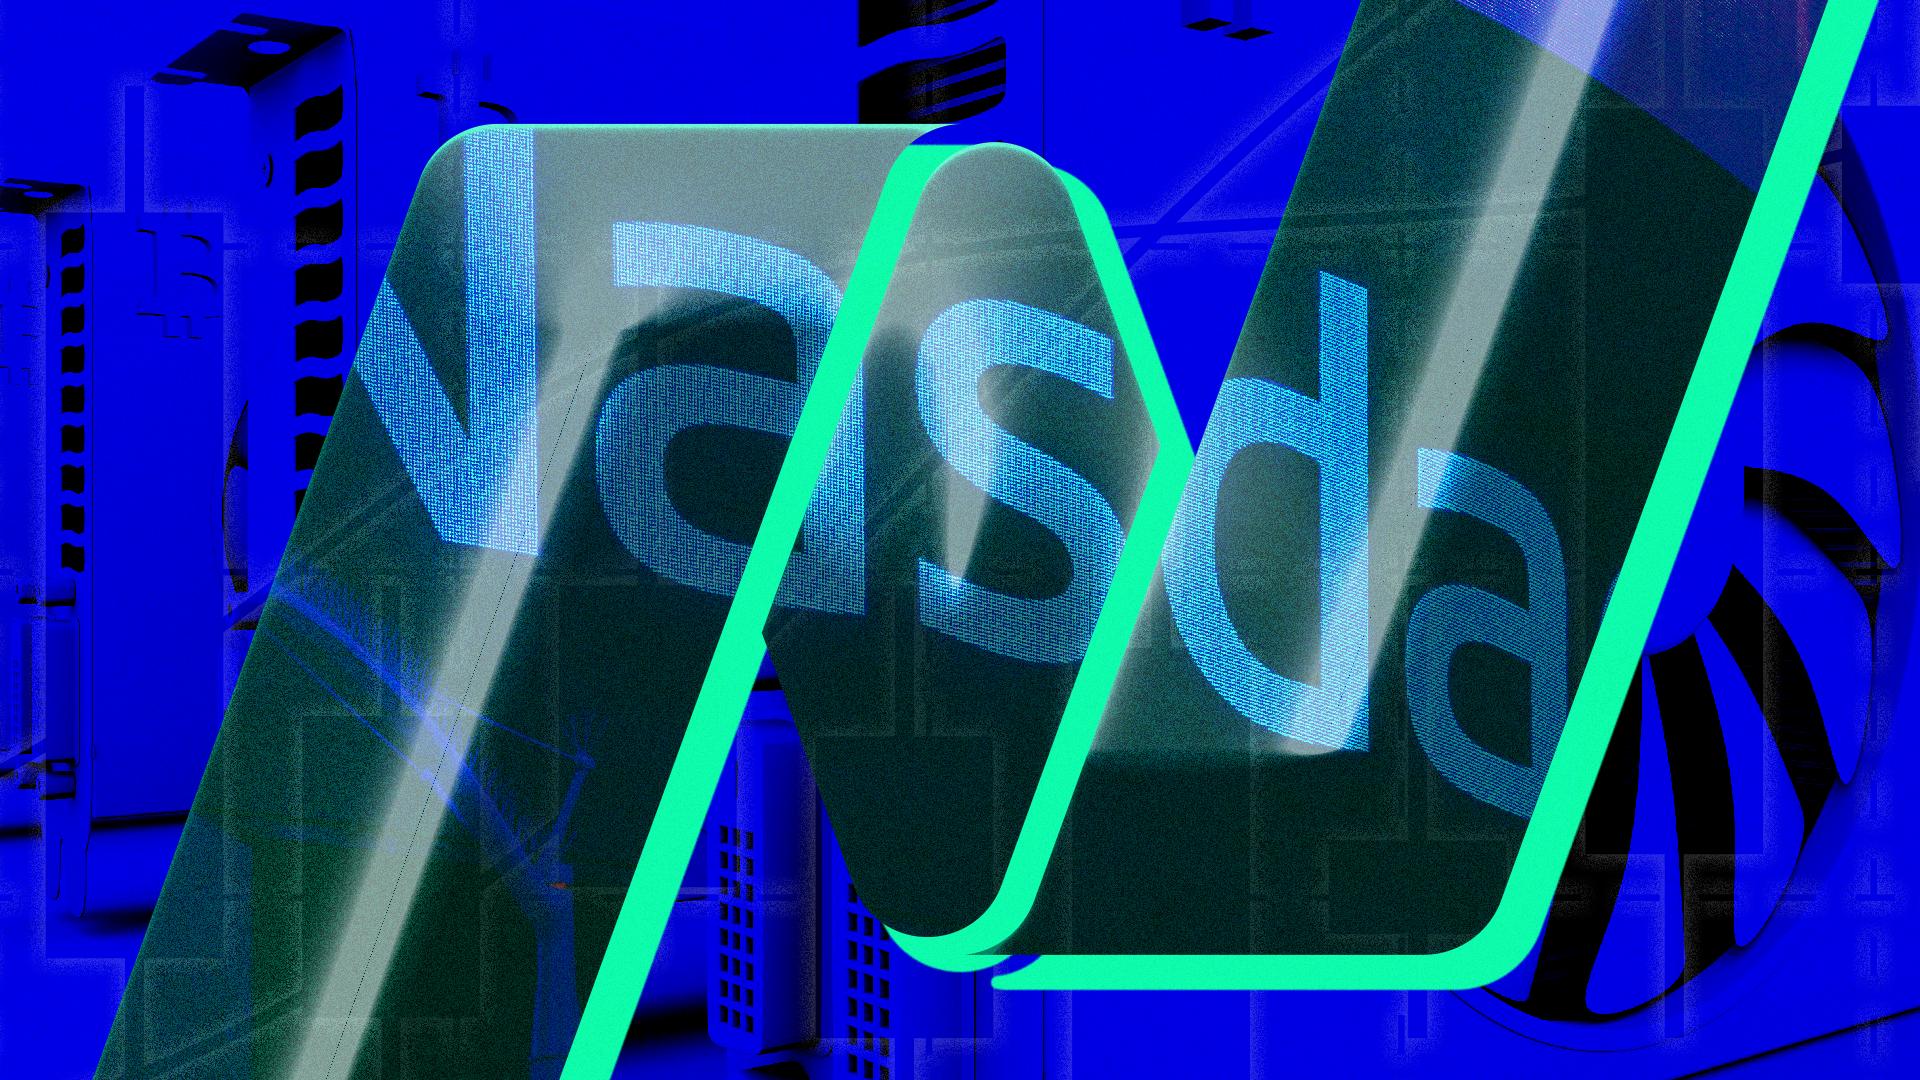 Nasdaq-listed firm mine bitcoin